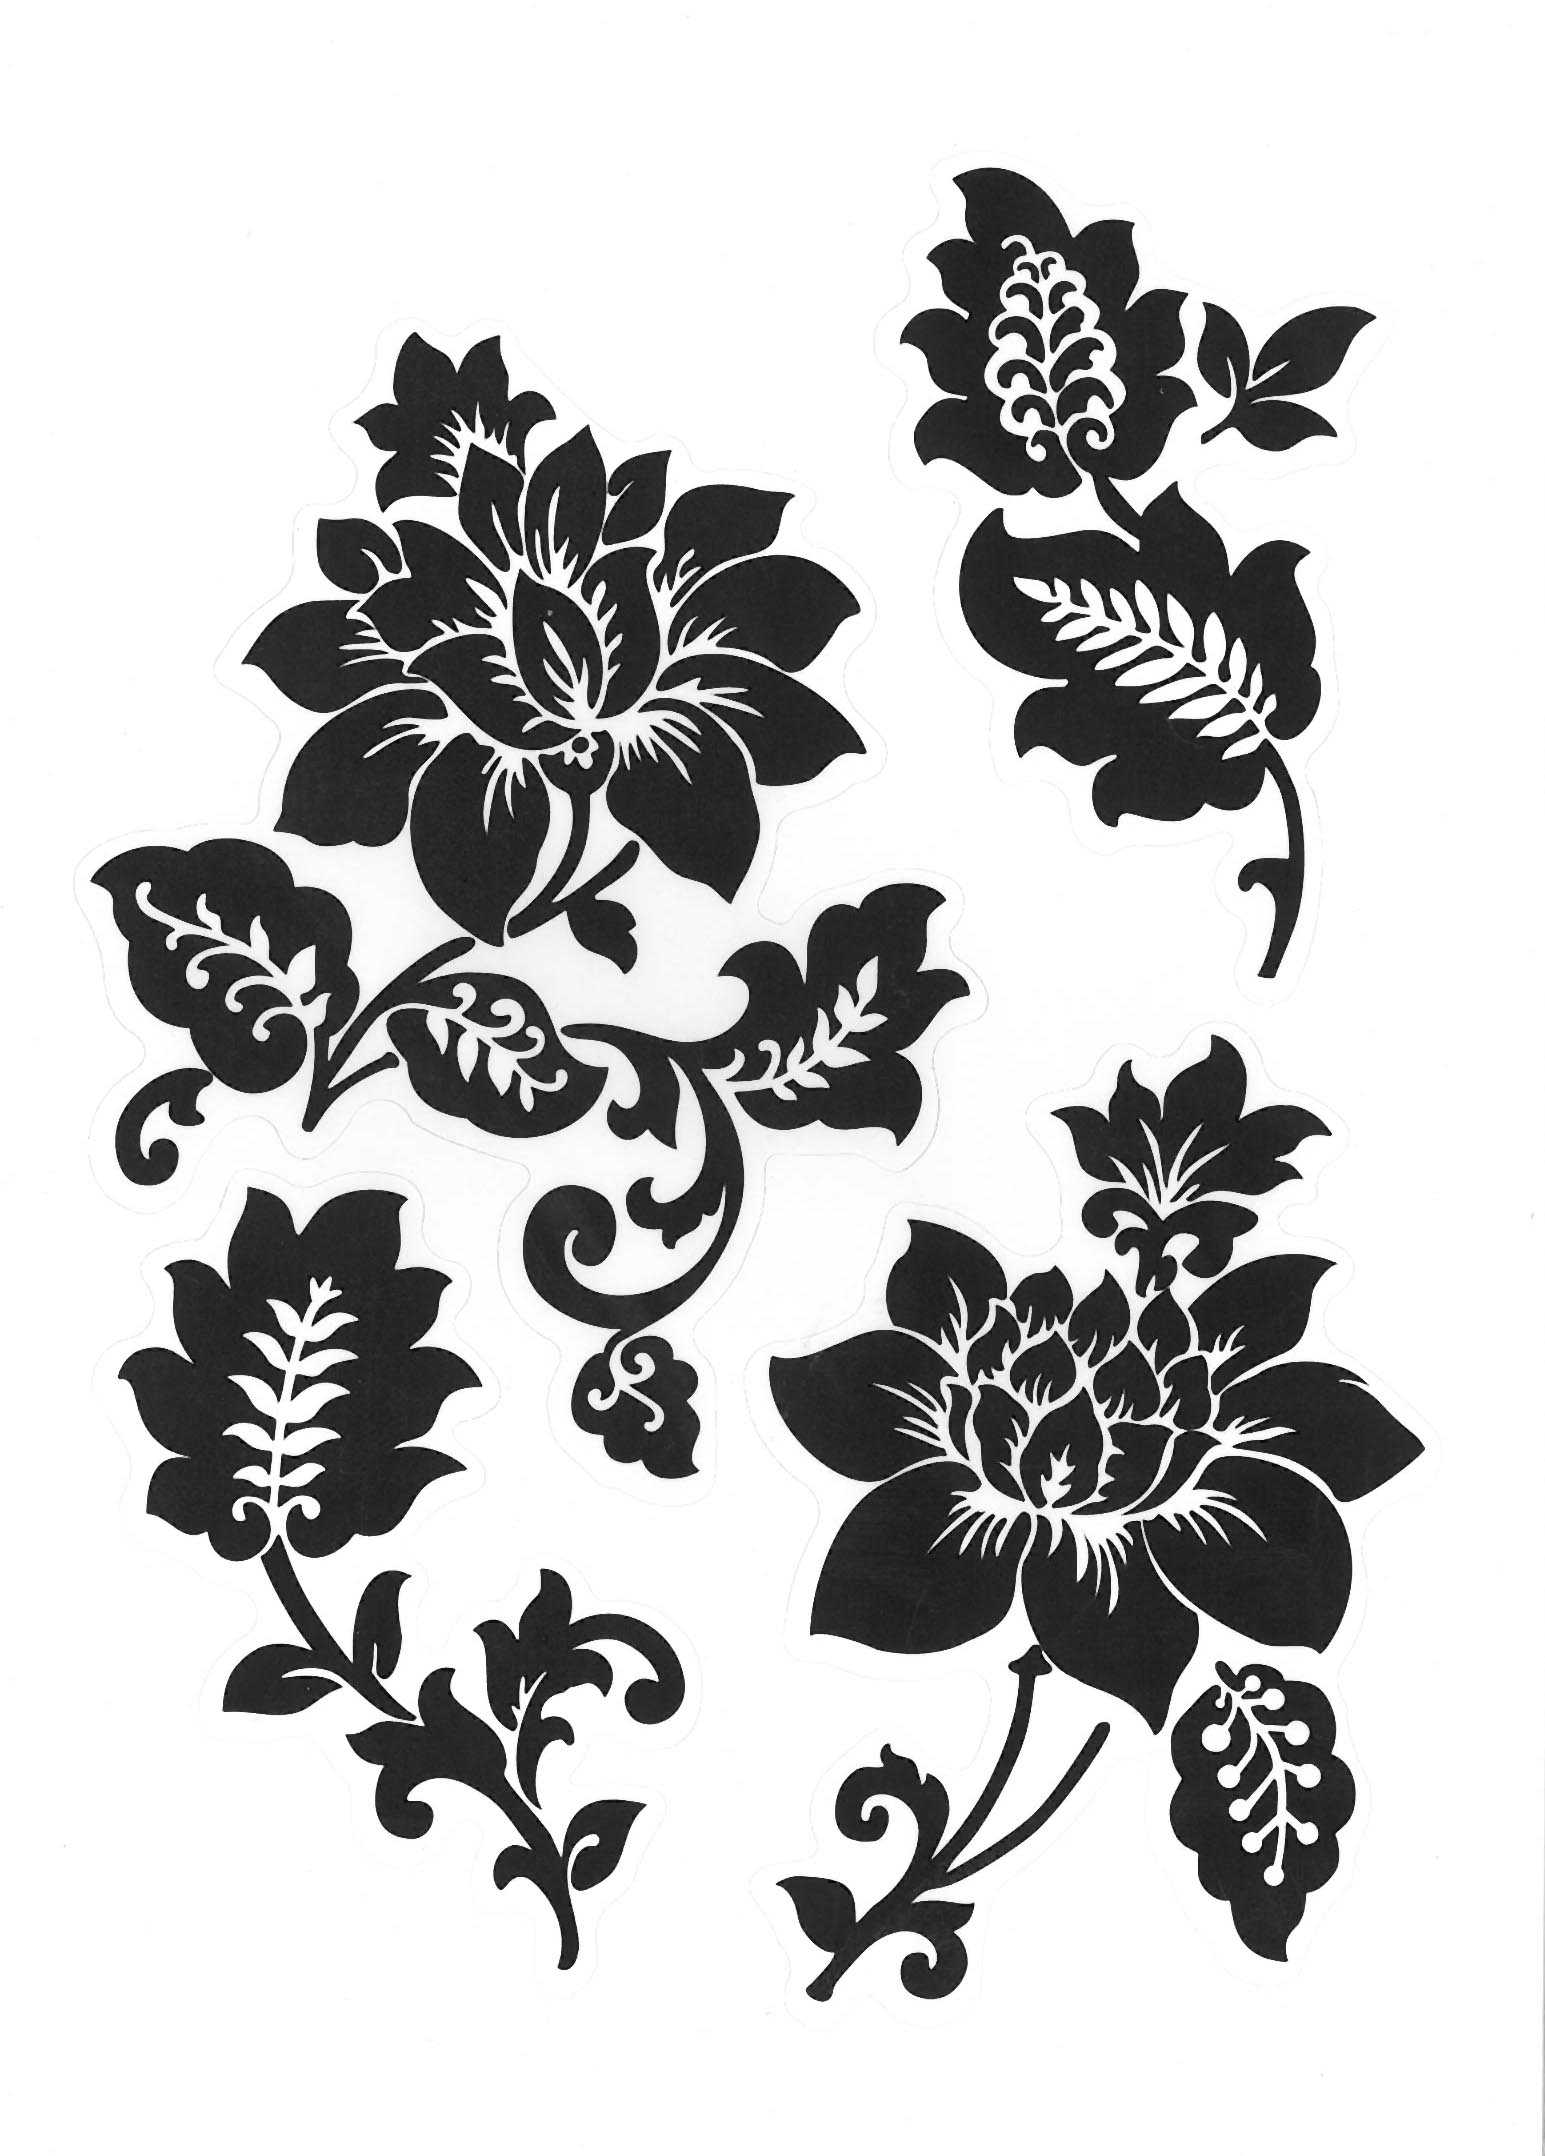 wandtattoo ornamente schwarz wei 50x70 cm nr 2 ebay. Black Bedroom Furniture Sets. Home Design Ideas